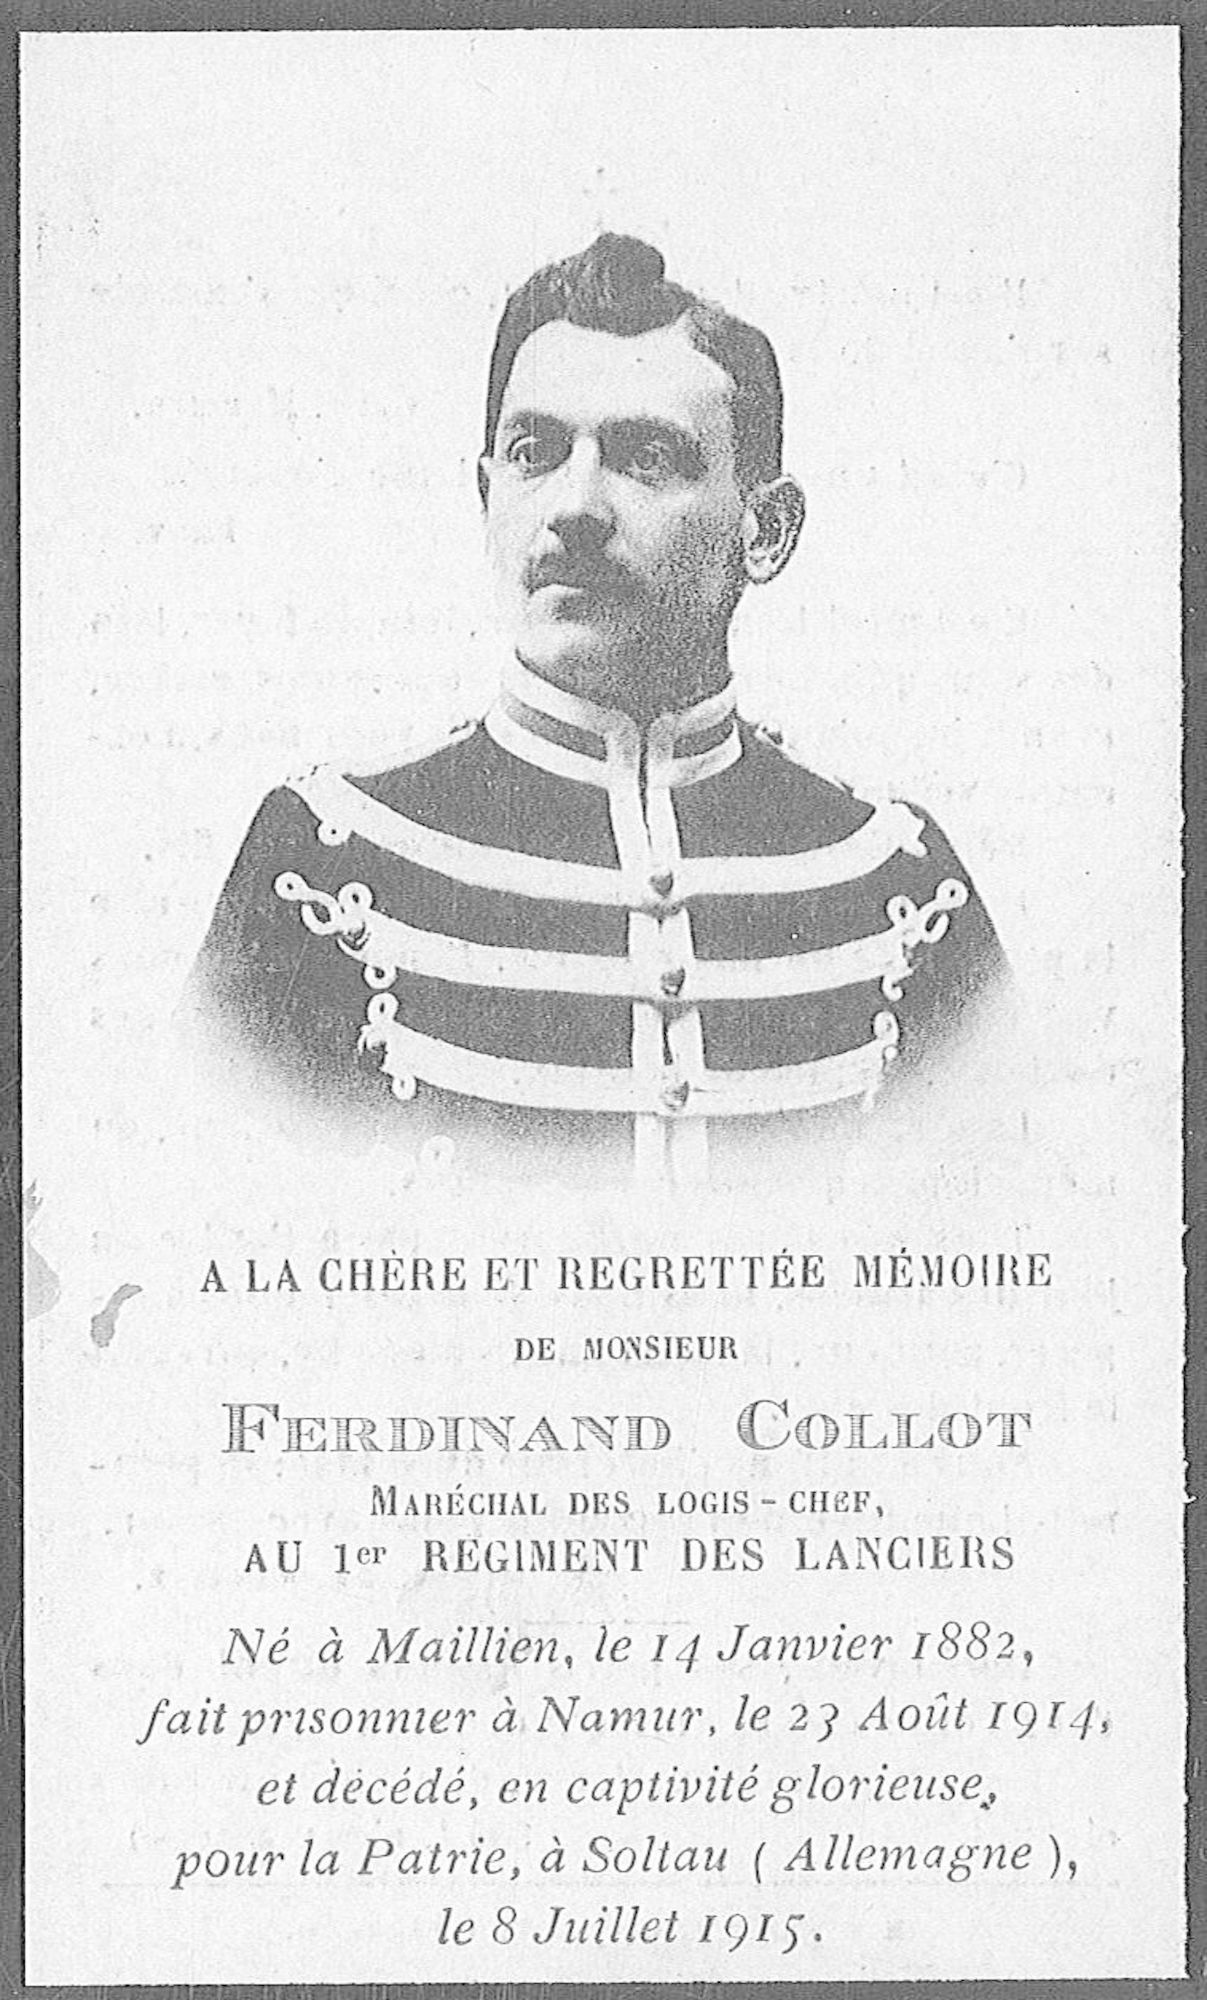 Collot Ferdinand